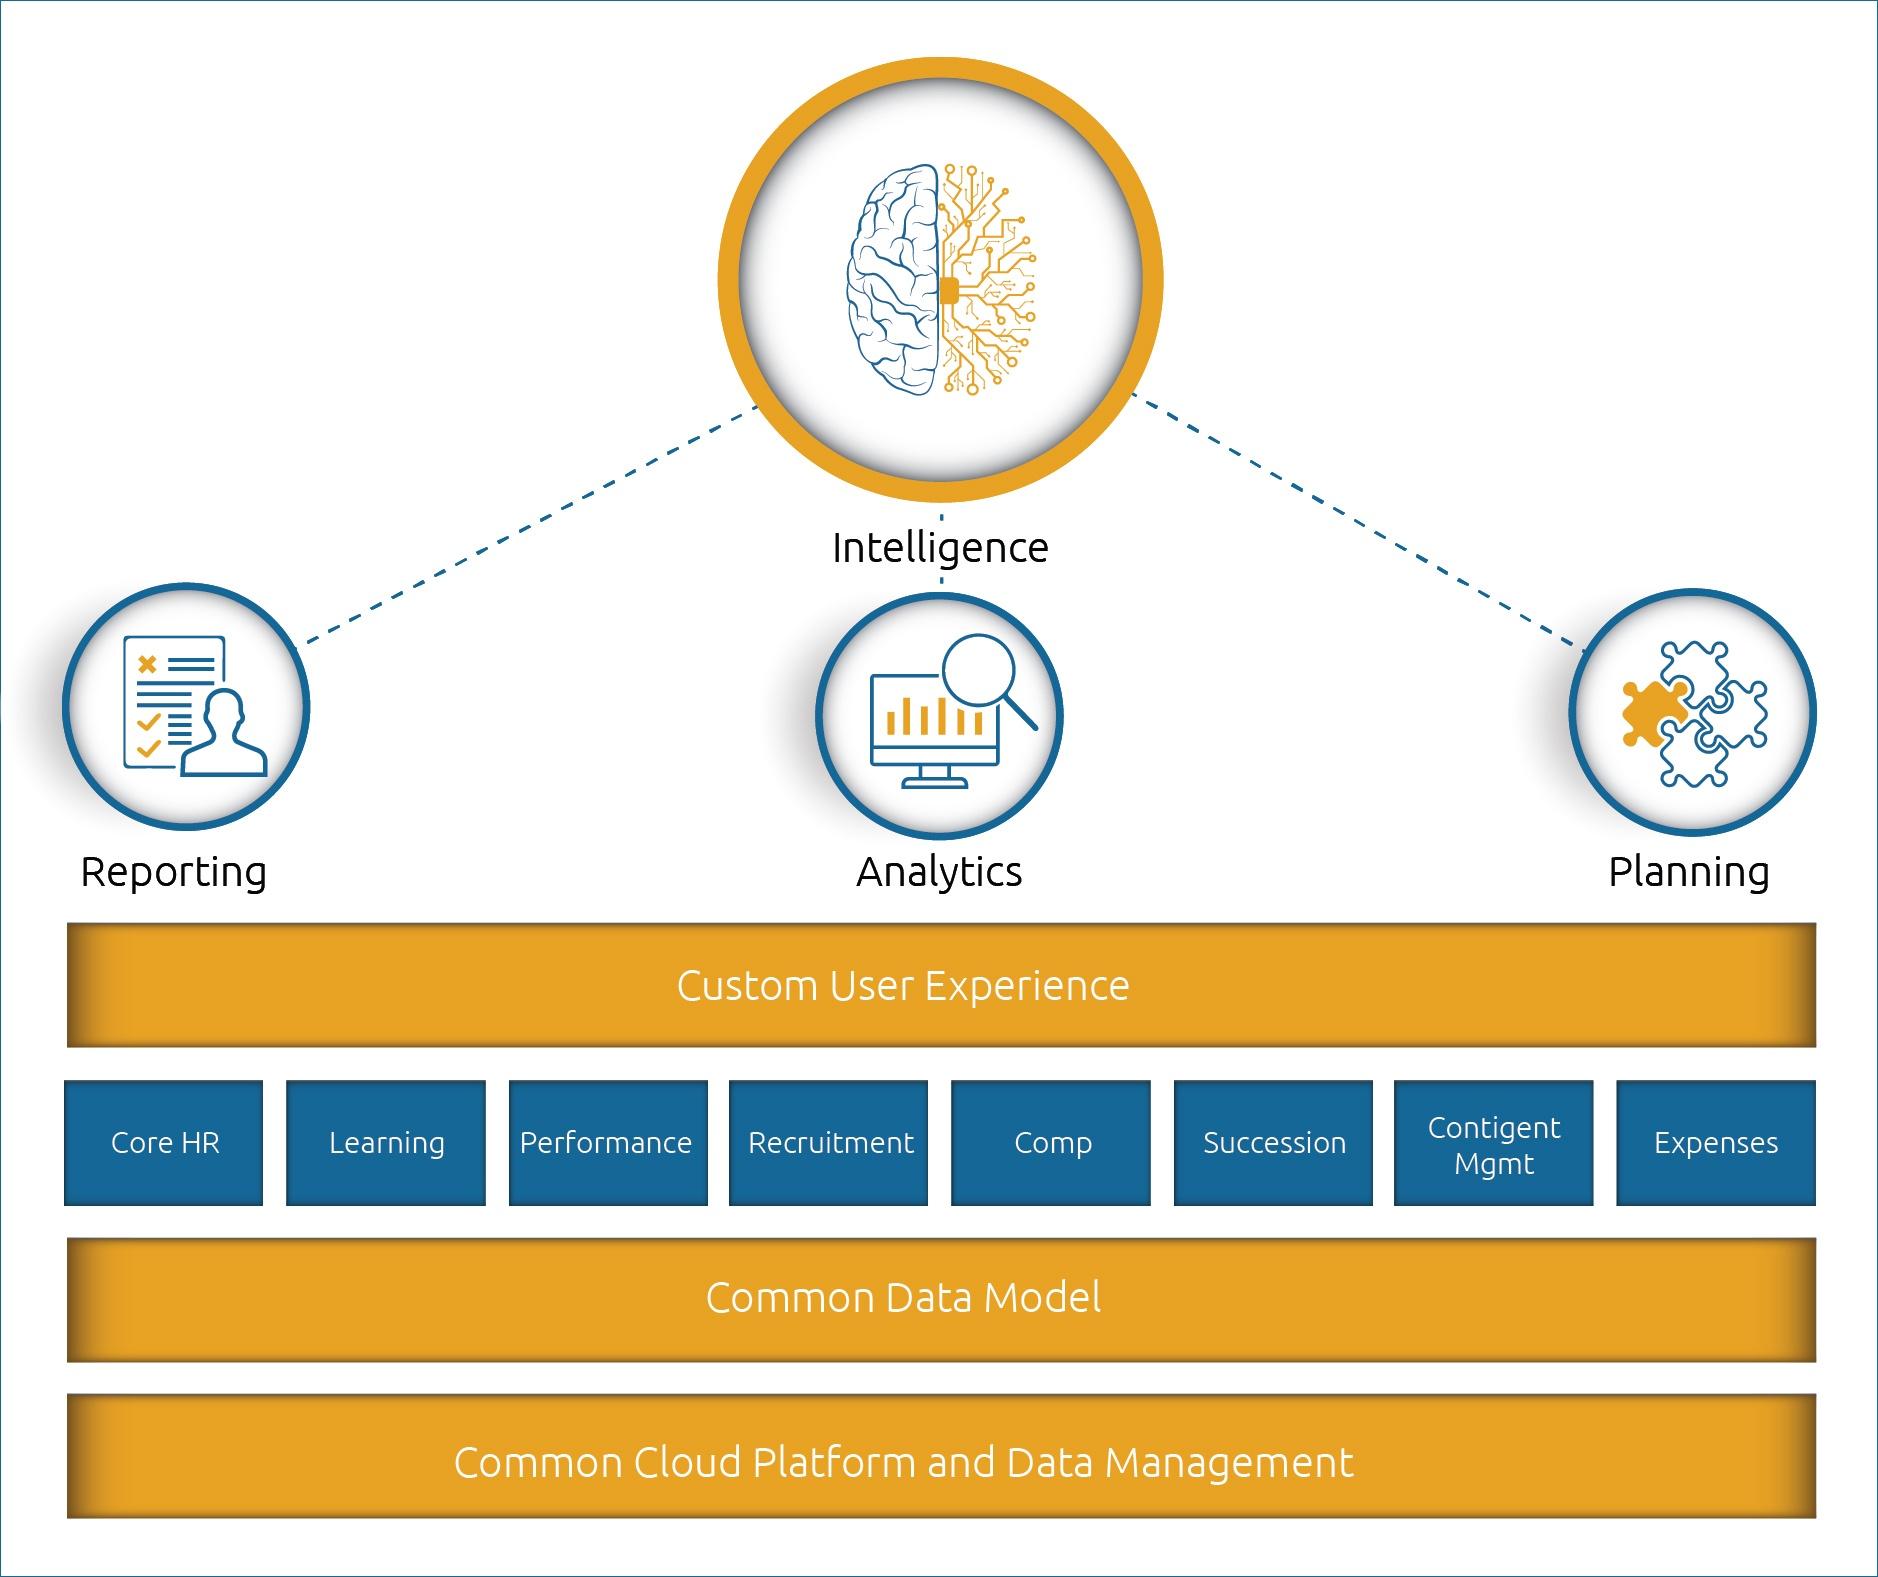 Intelligence Infographic_new